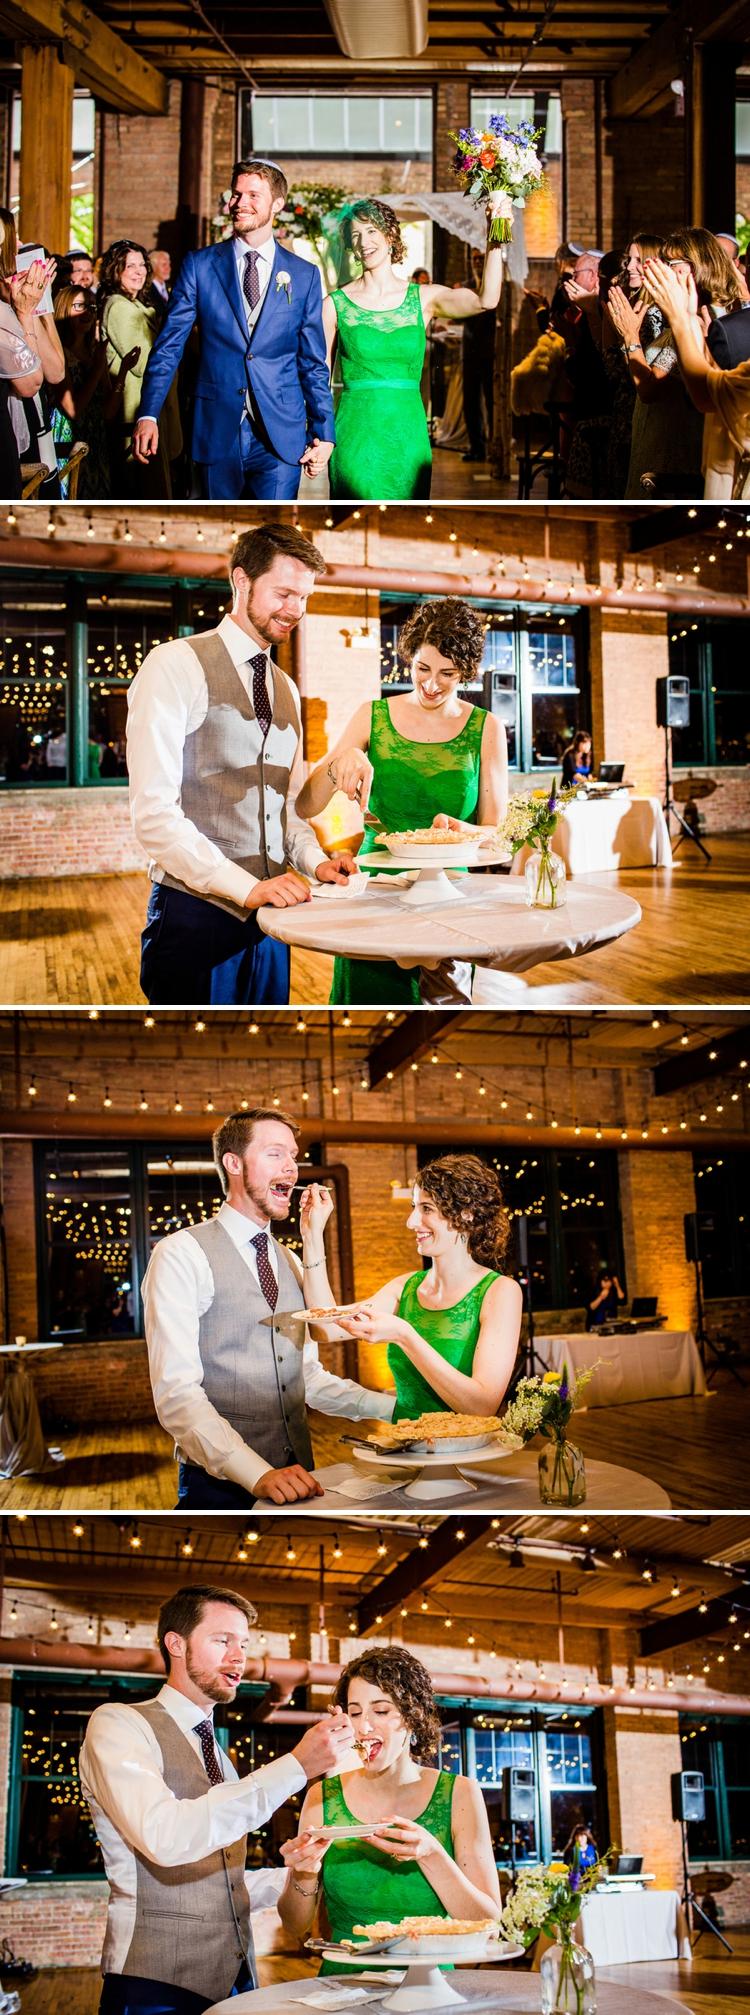 A bride in a greaen wedding dress for a creative Jewish wedding at Bridgeport Art Center, Chicago, USA_0497